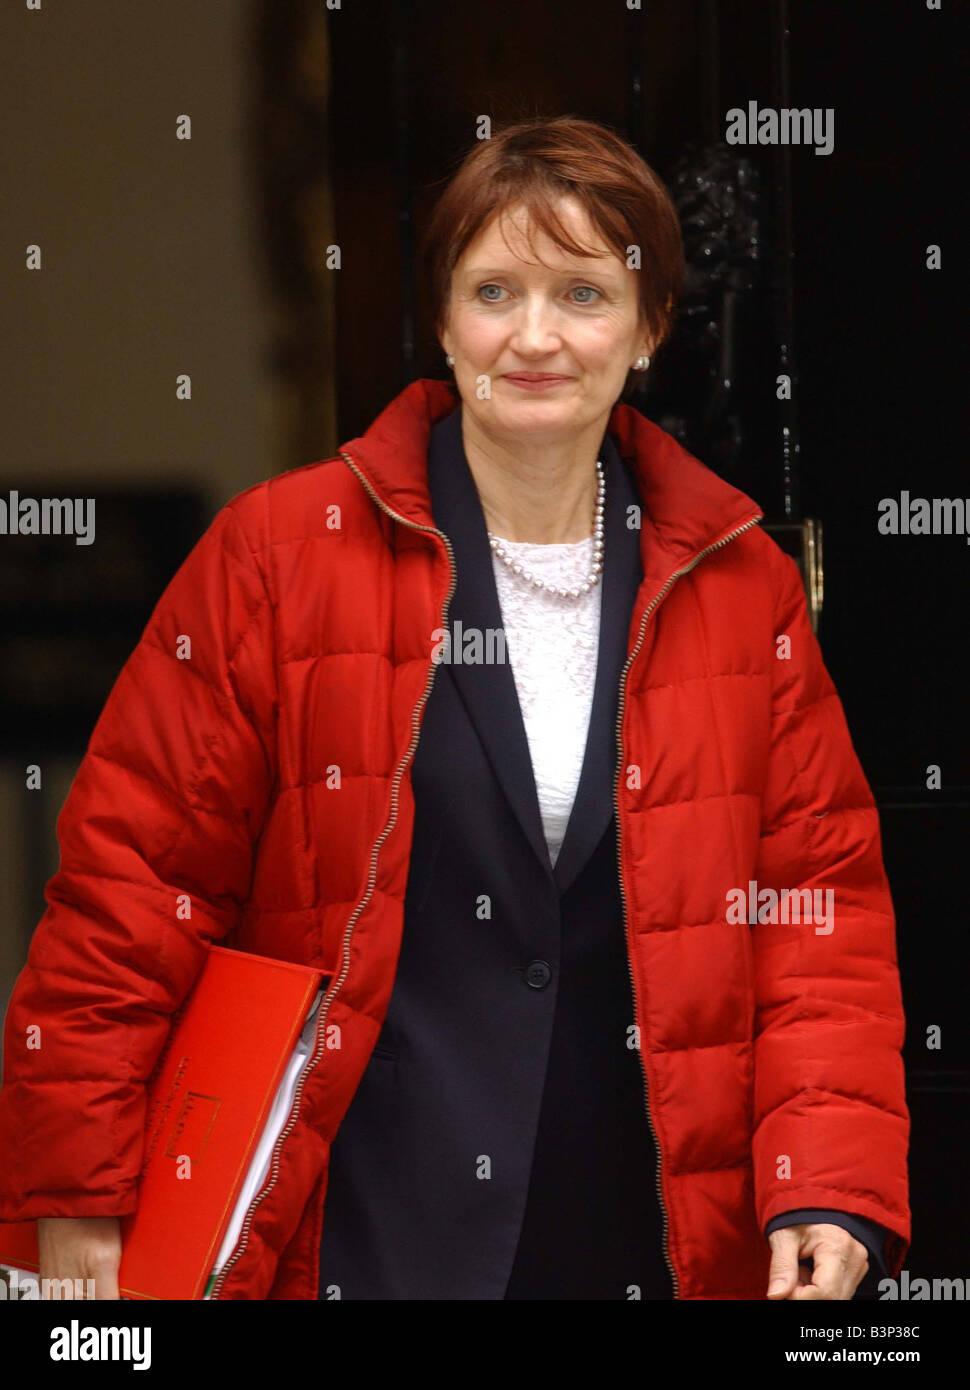 Tessa Jowell MP leaving Downing Street 2003 - Stock Image